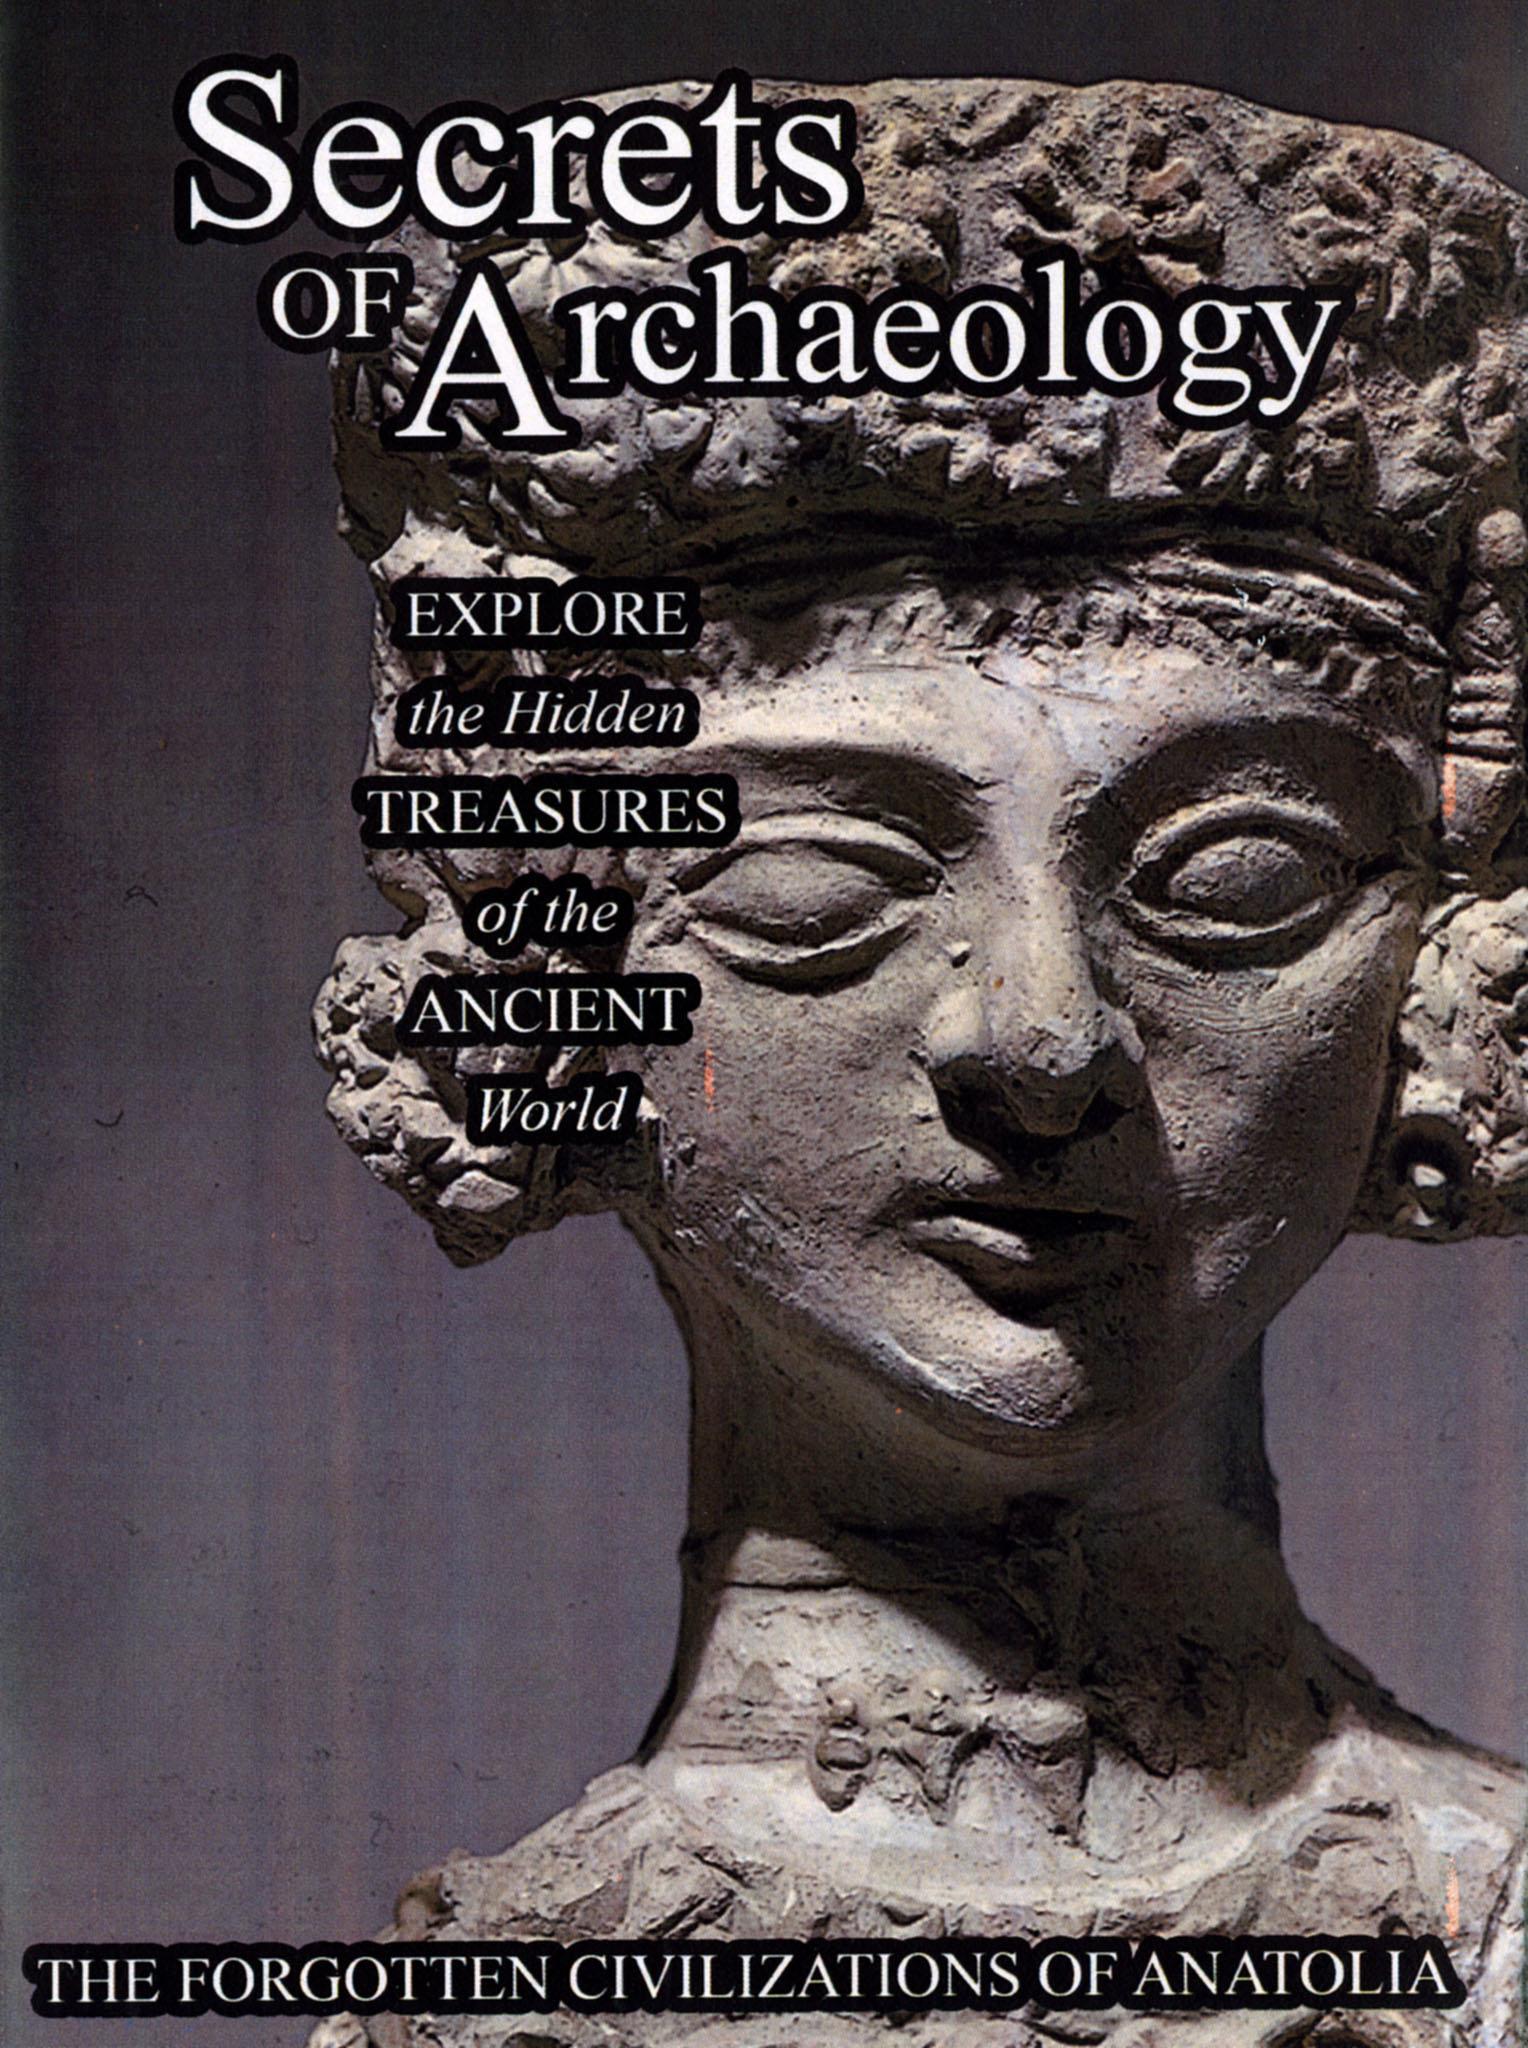 Secrets of Archaeology: The Forgotten Civilizations on Anatolia